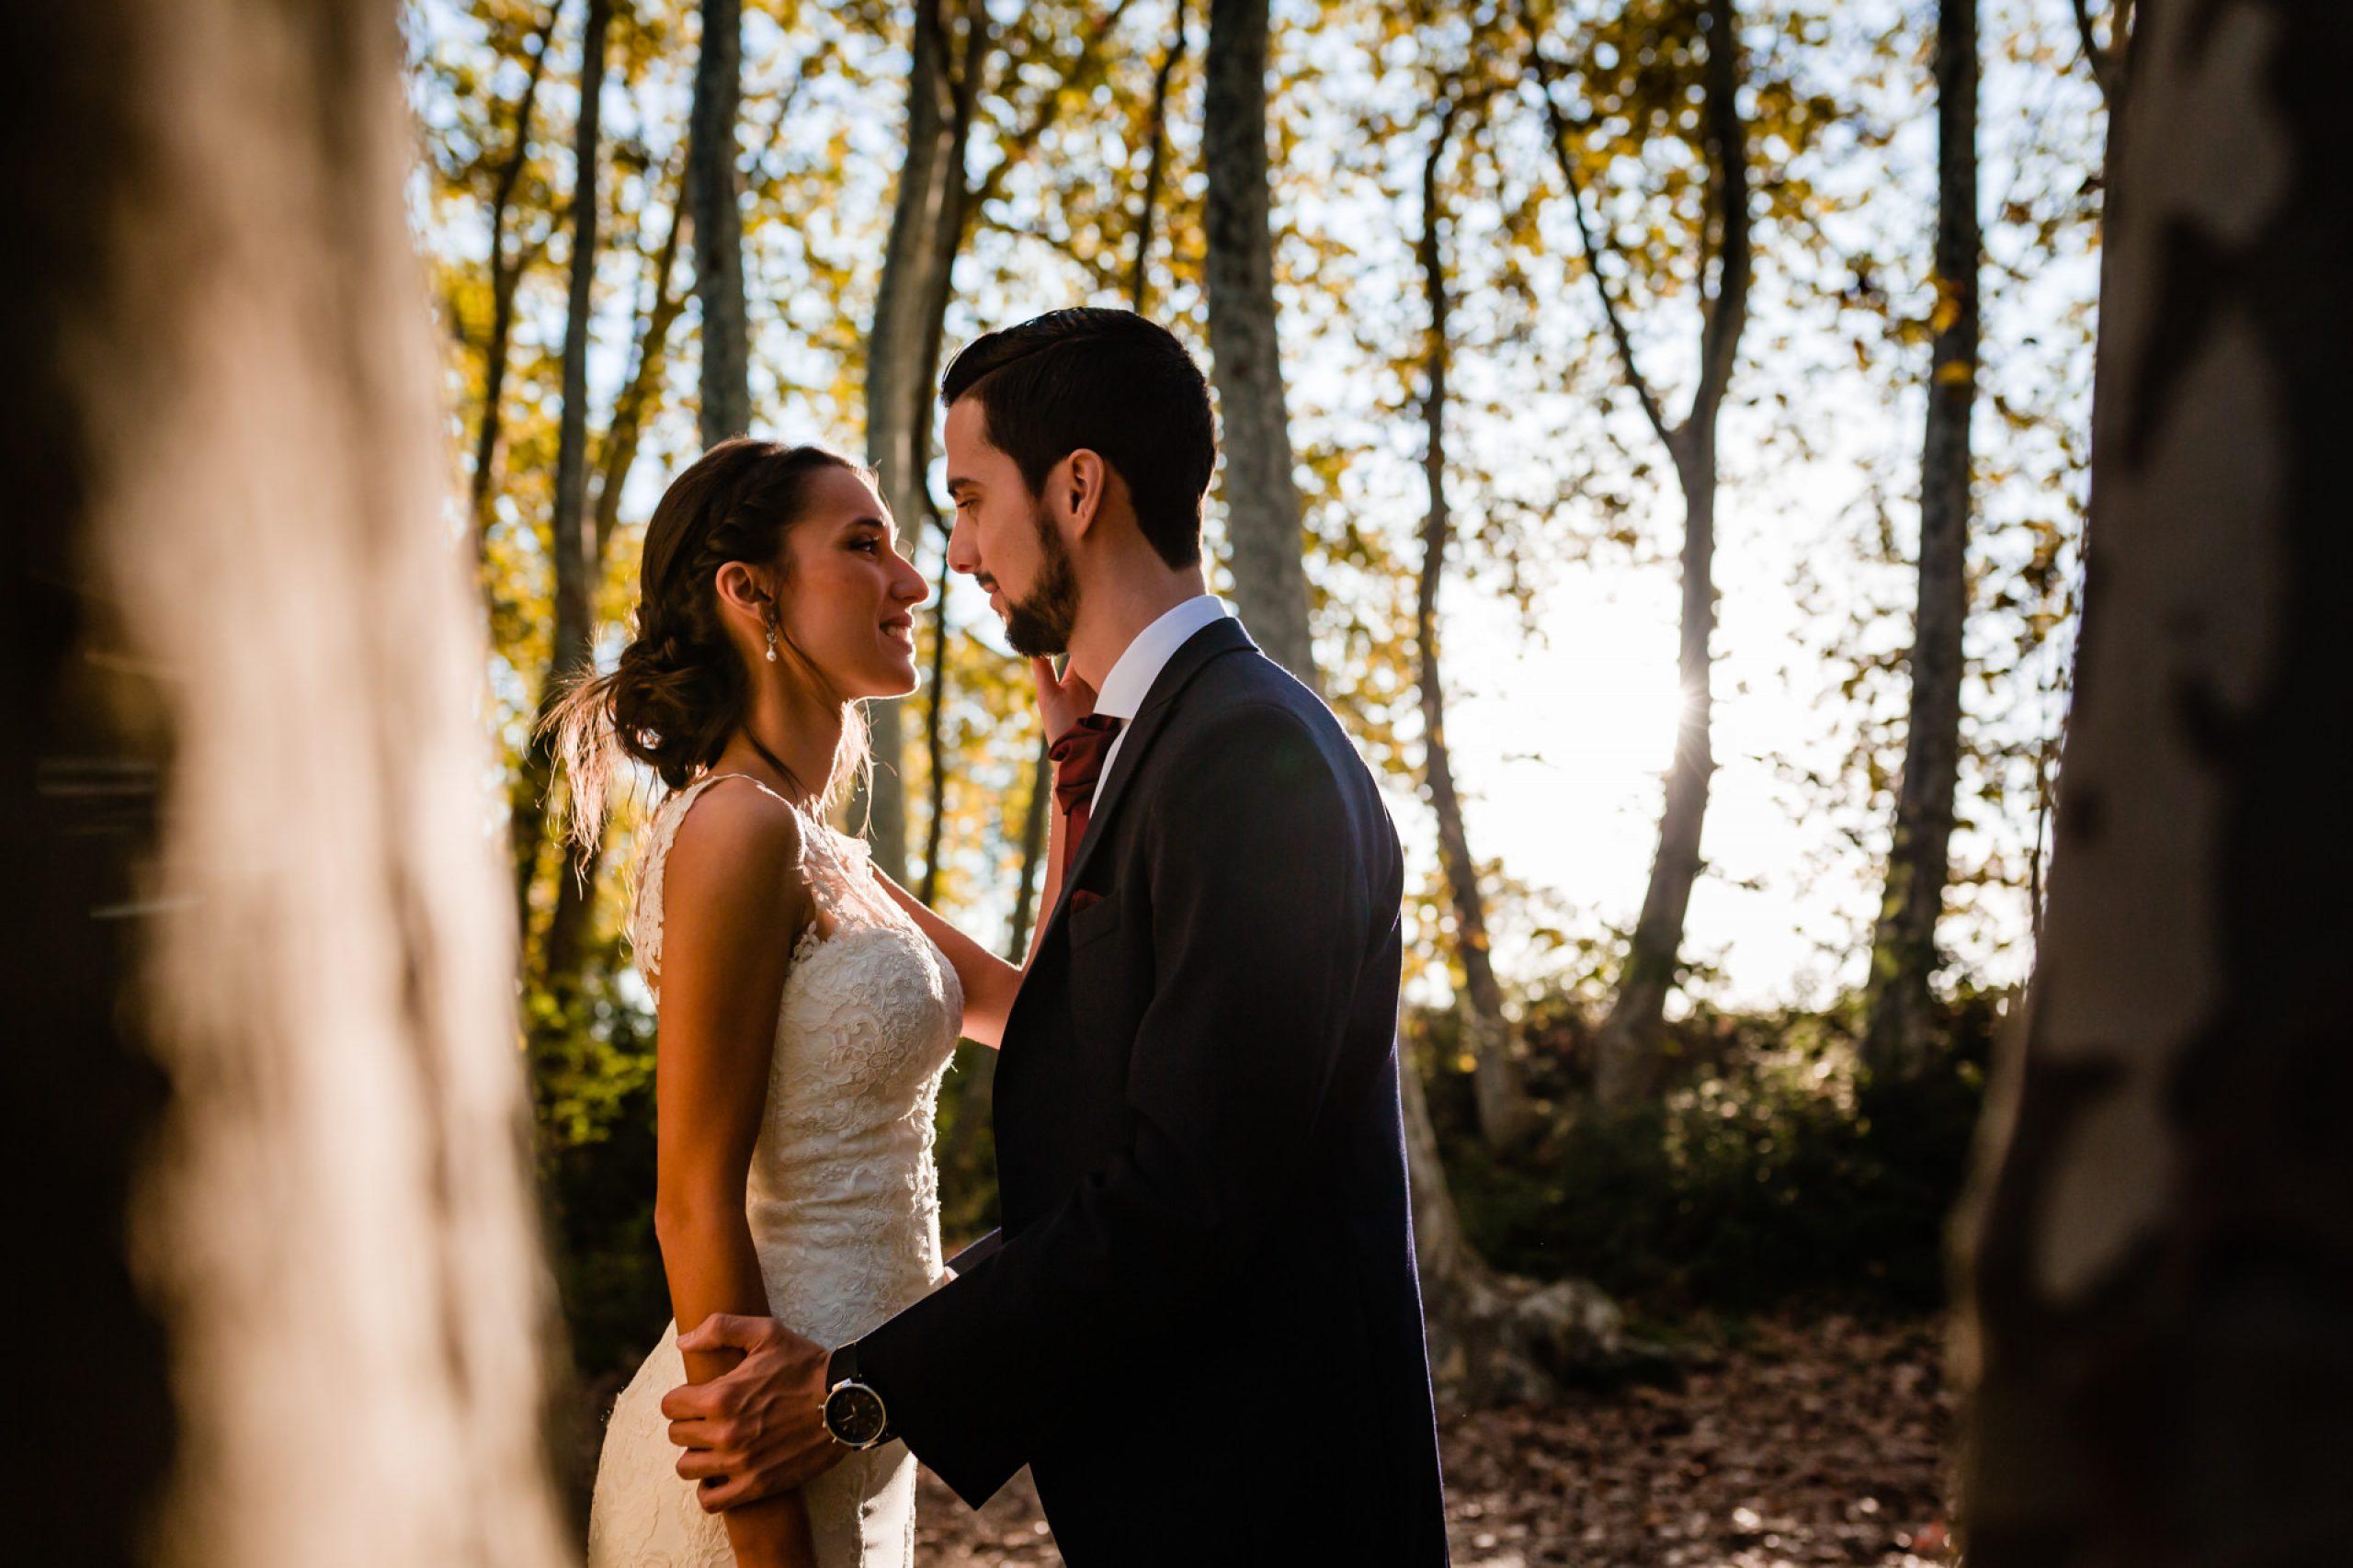 LuzdeBarcelona-postboda-boda-fotografo-cerdanyola-30